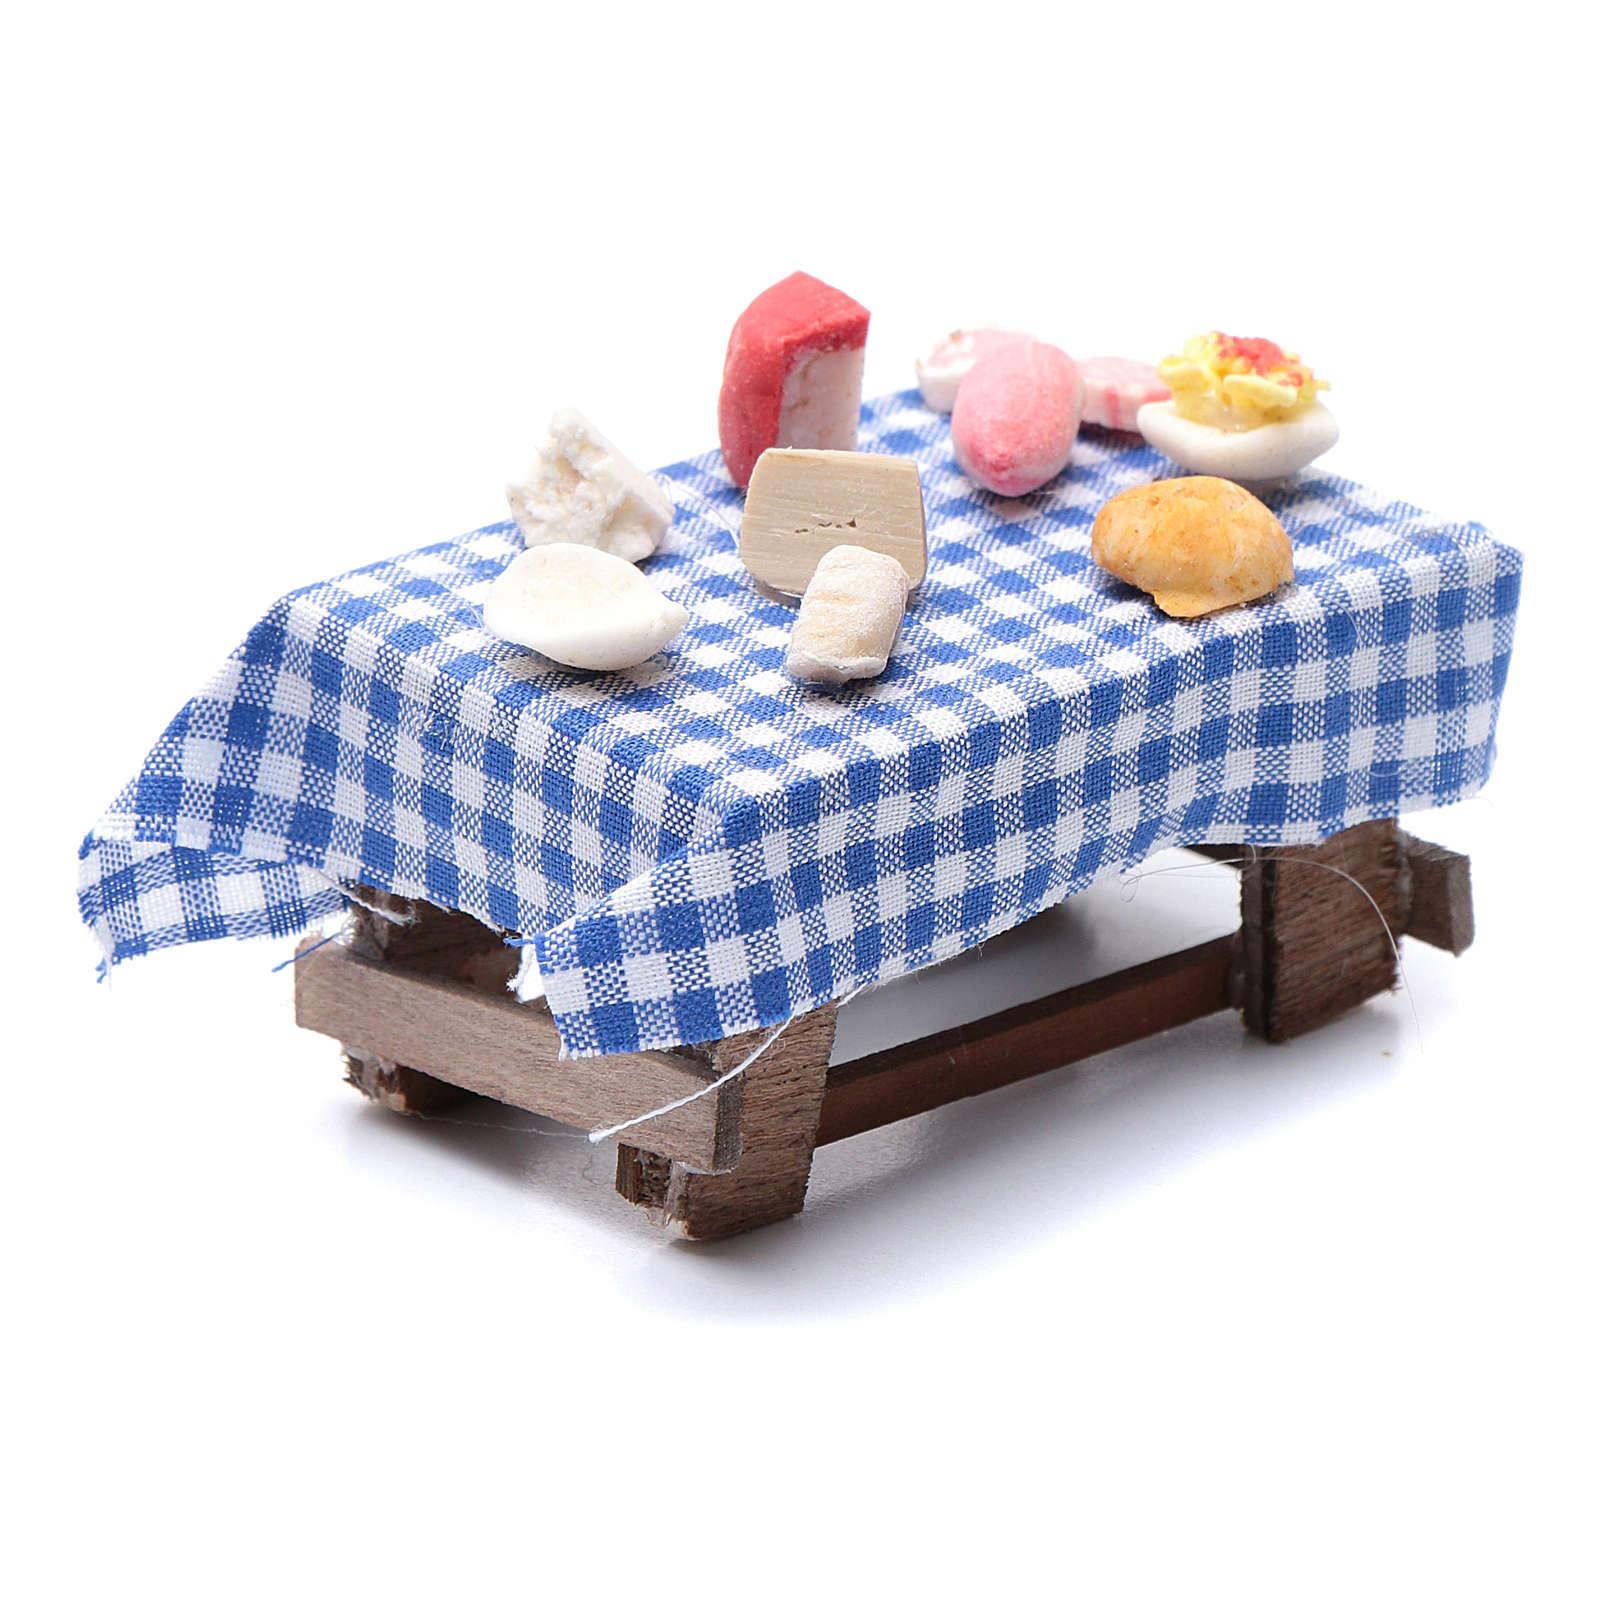 Neapolitan nativity scene laid table 5x5,5X5 cm 4